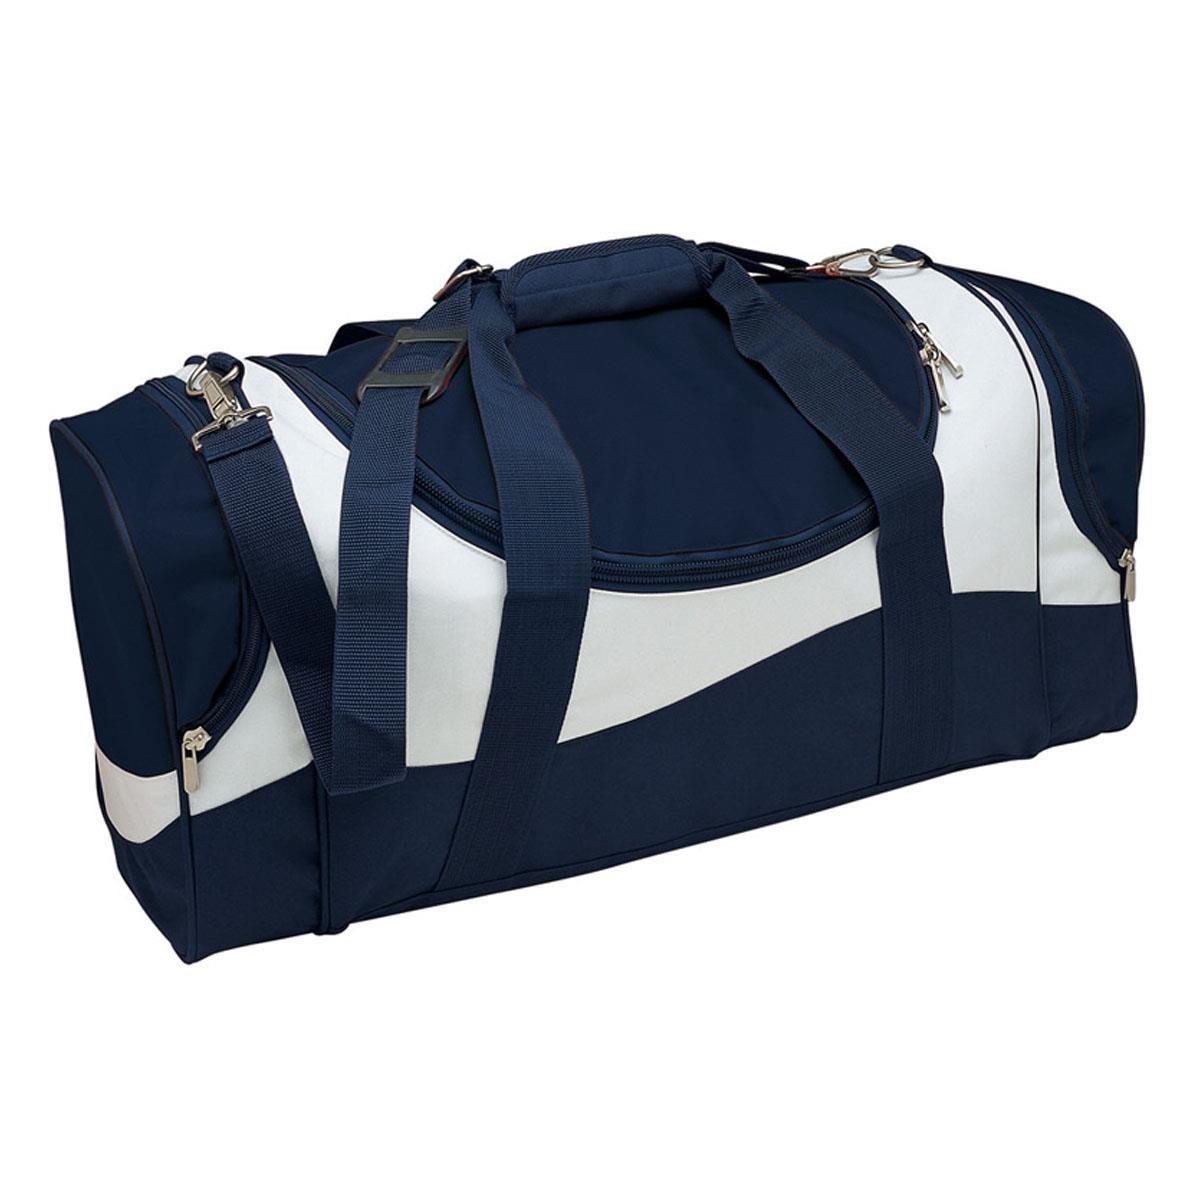 Sunset Sports Bag - Navy & White